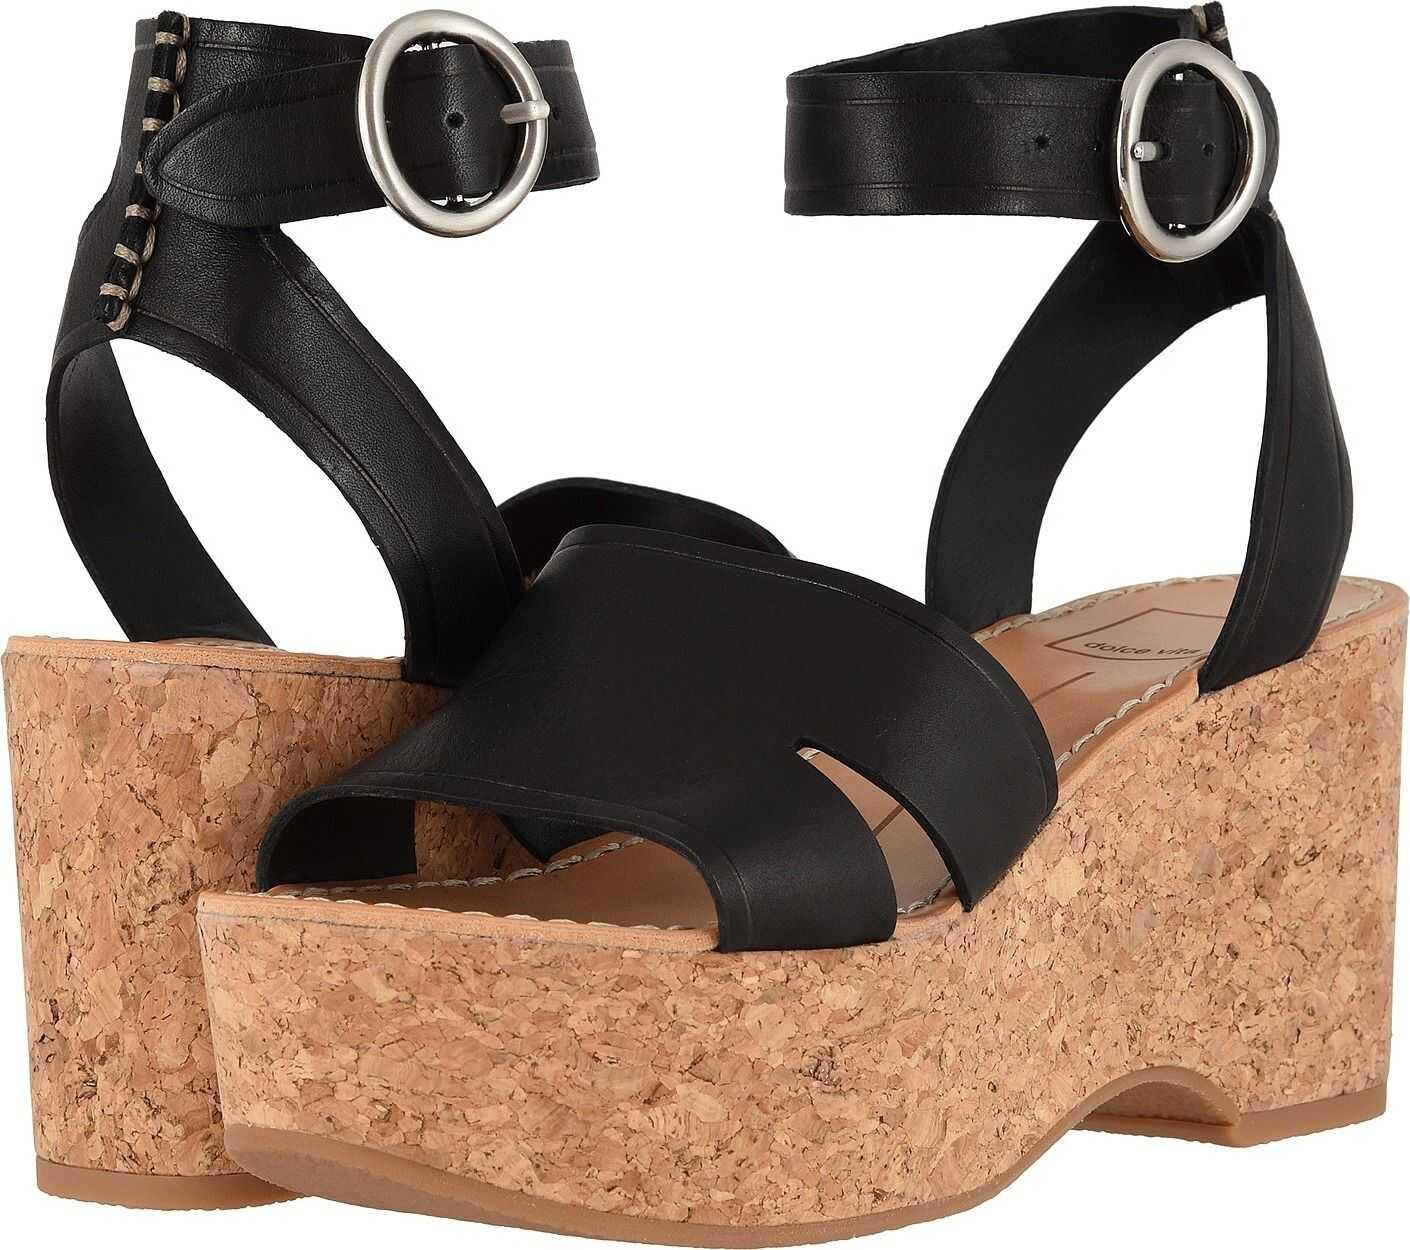 Dolce Vita Linda Black Leather